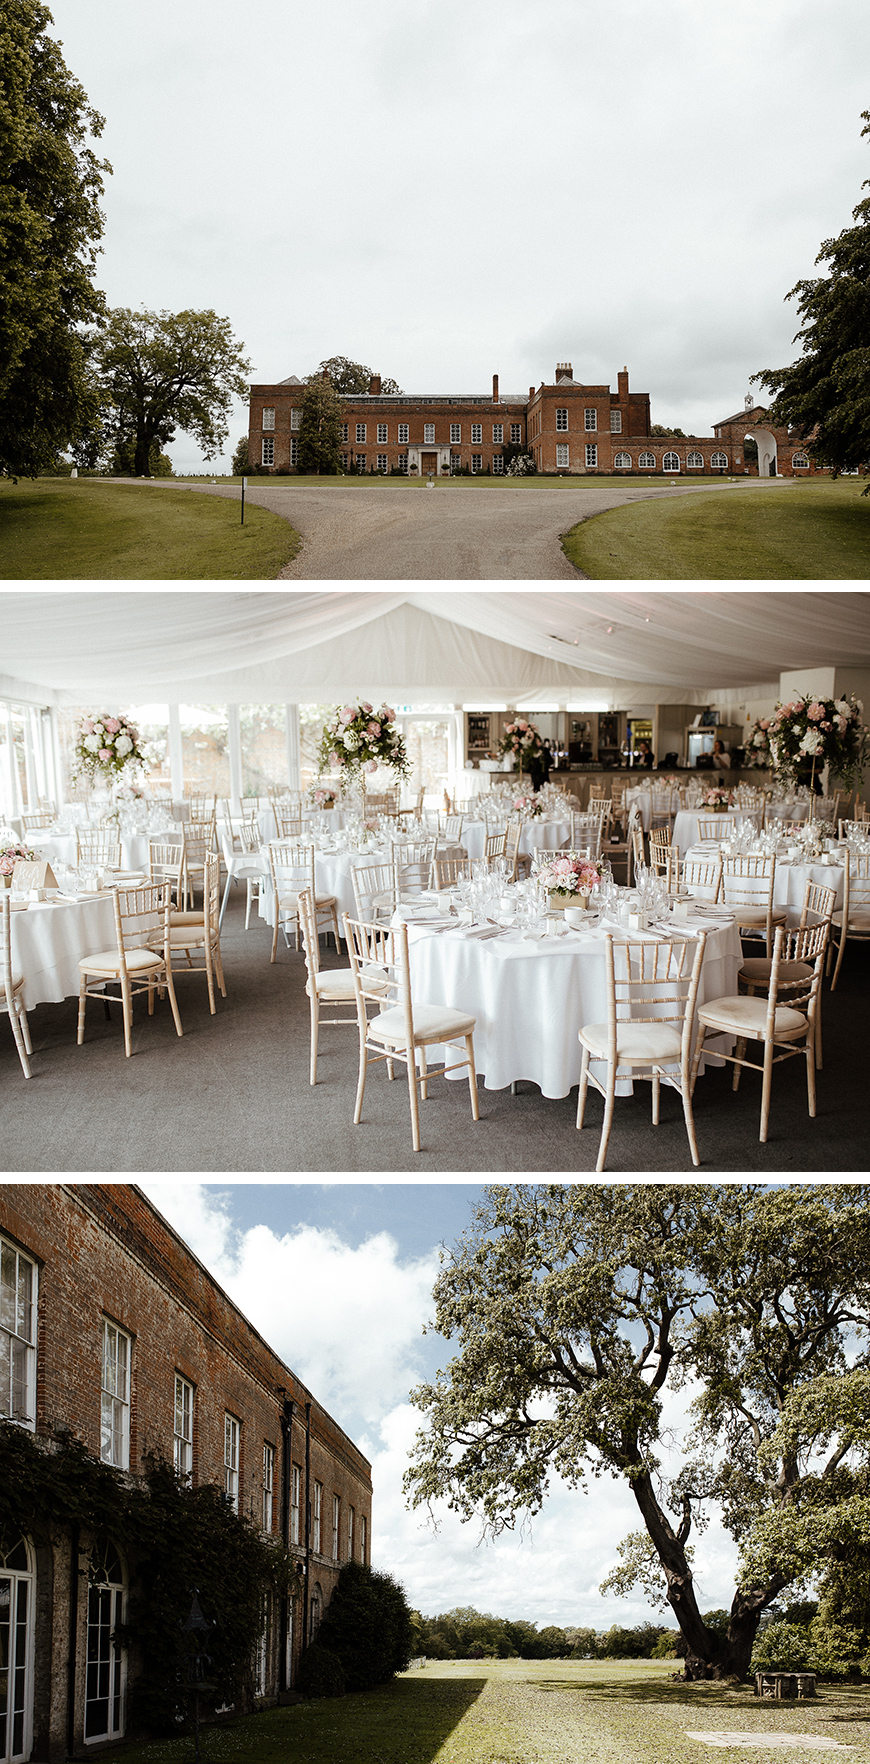 Real Wedding - Nina and Michael's Serene Summer Wedding at Braxted Park | CHWV